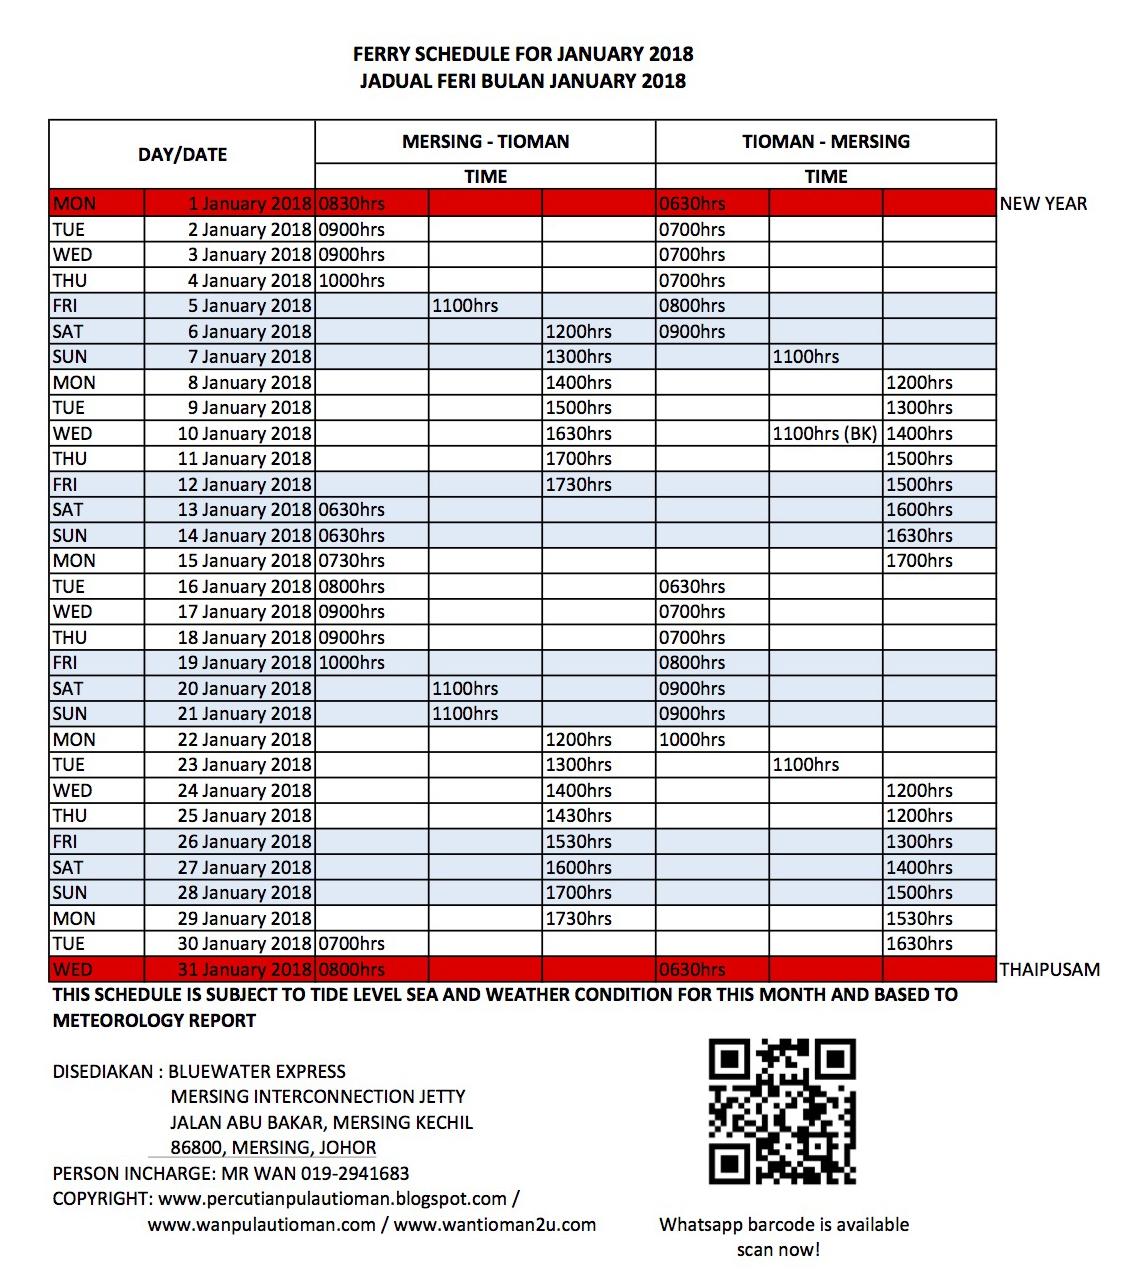 Tioman Ferry Transfer Schedule January 2018